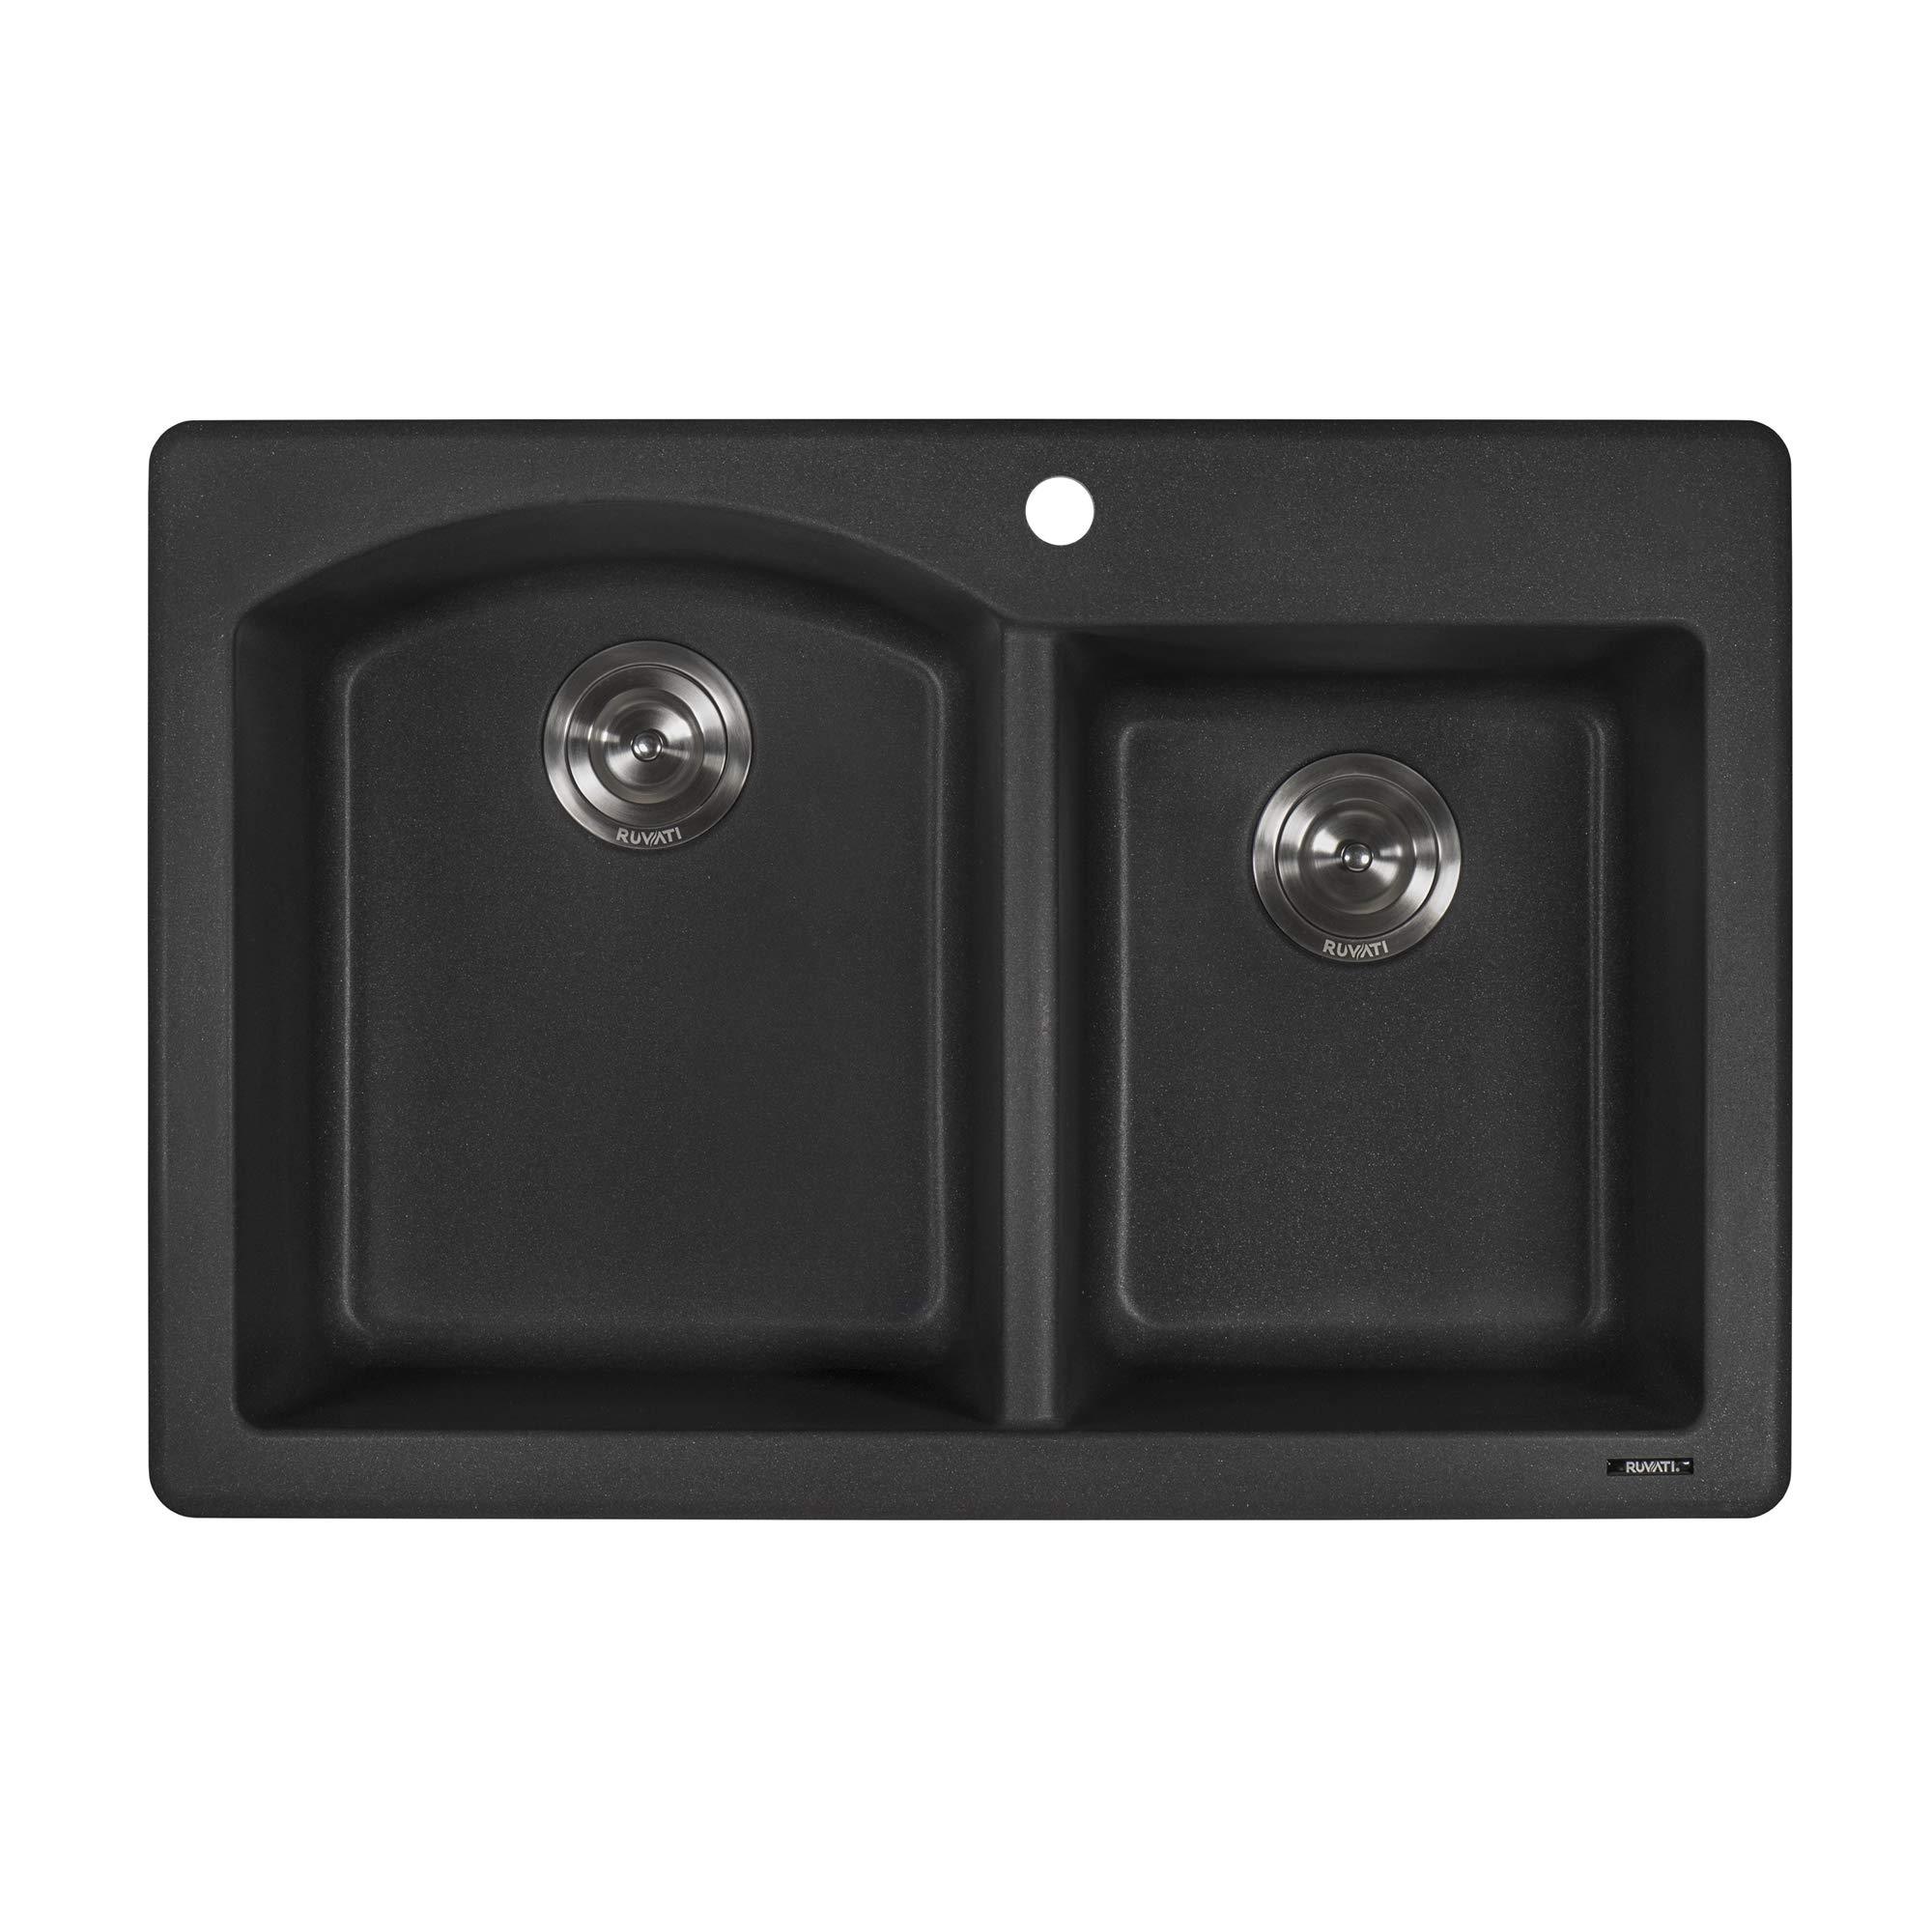 Ruvati 33 x 22 inch Dual-Mount Granite Composite Double Bowl Kitchen Sink - Black Galaxy - RVH1344GX